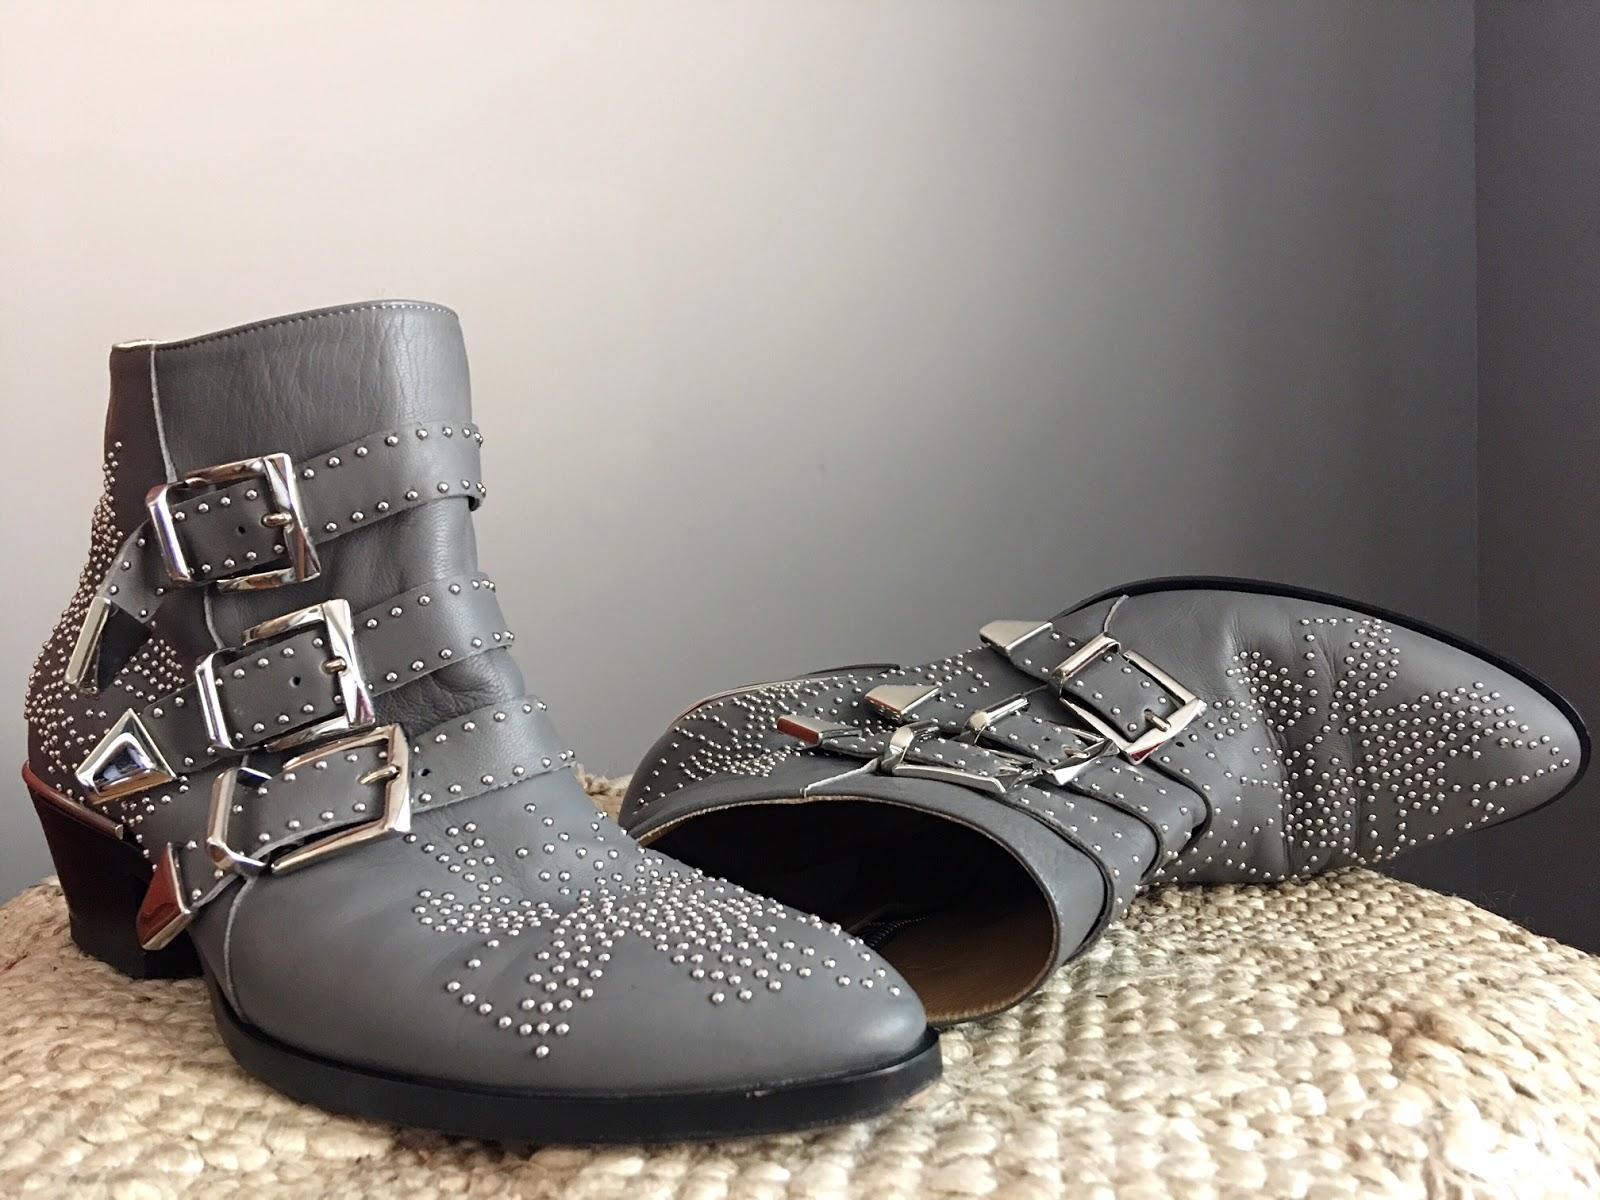 Shoe dreams do come true!